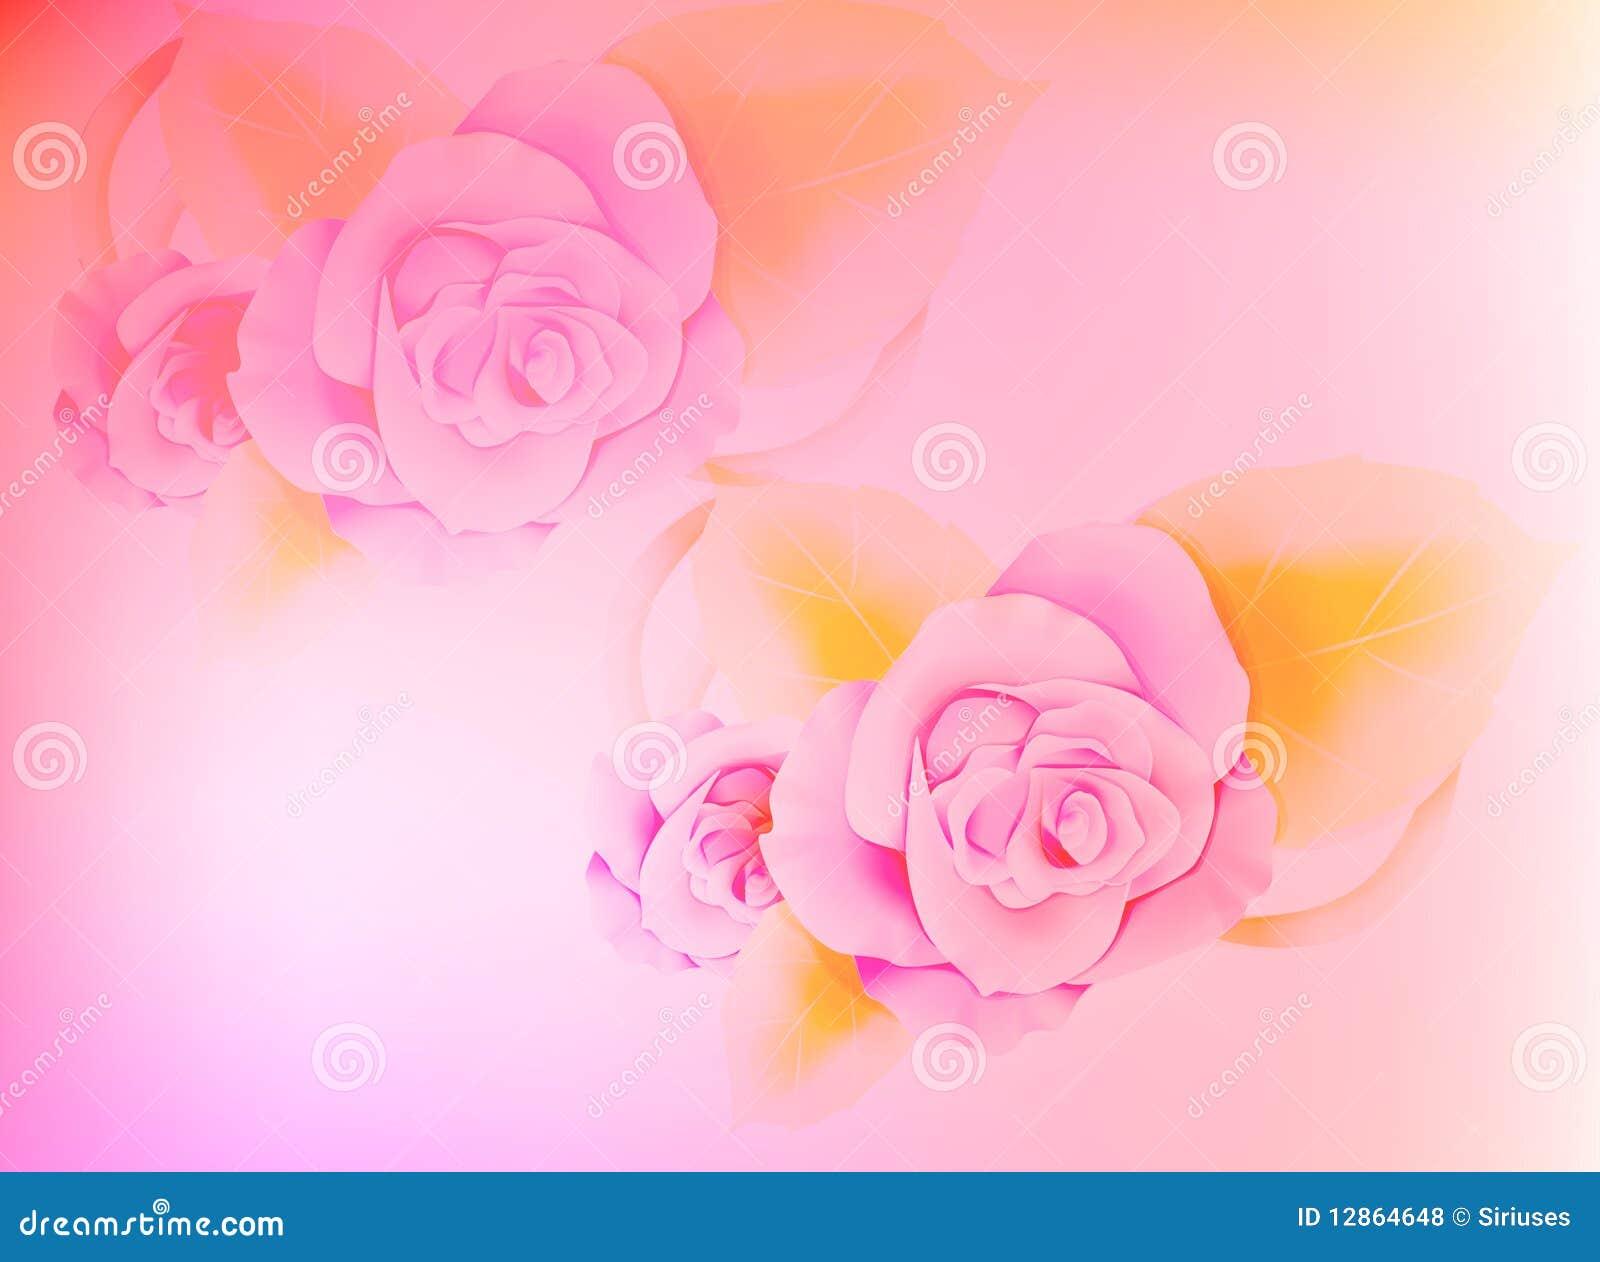 Pink flower background stock illustration illustration of light pink flower background mightylinksfo